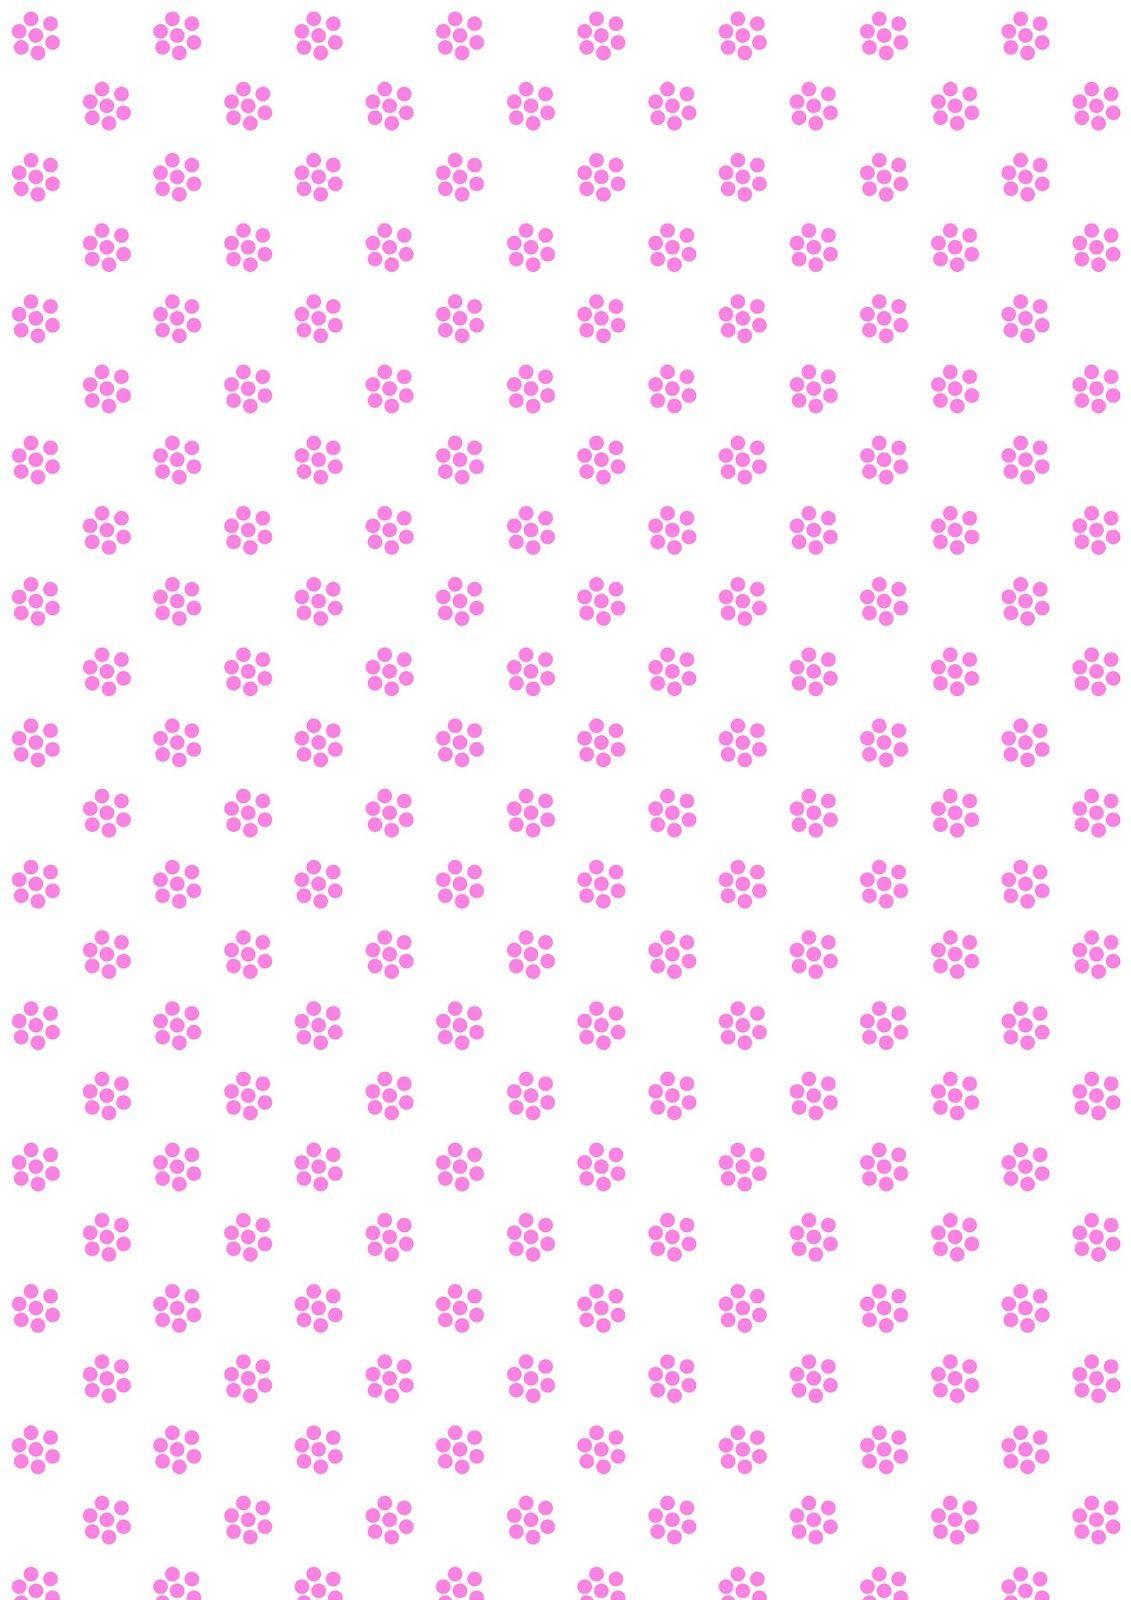 Free Digital Floral Pattern Paper | Free Printables ✄ And More - Free Printable Pattern Paper Sheets